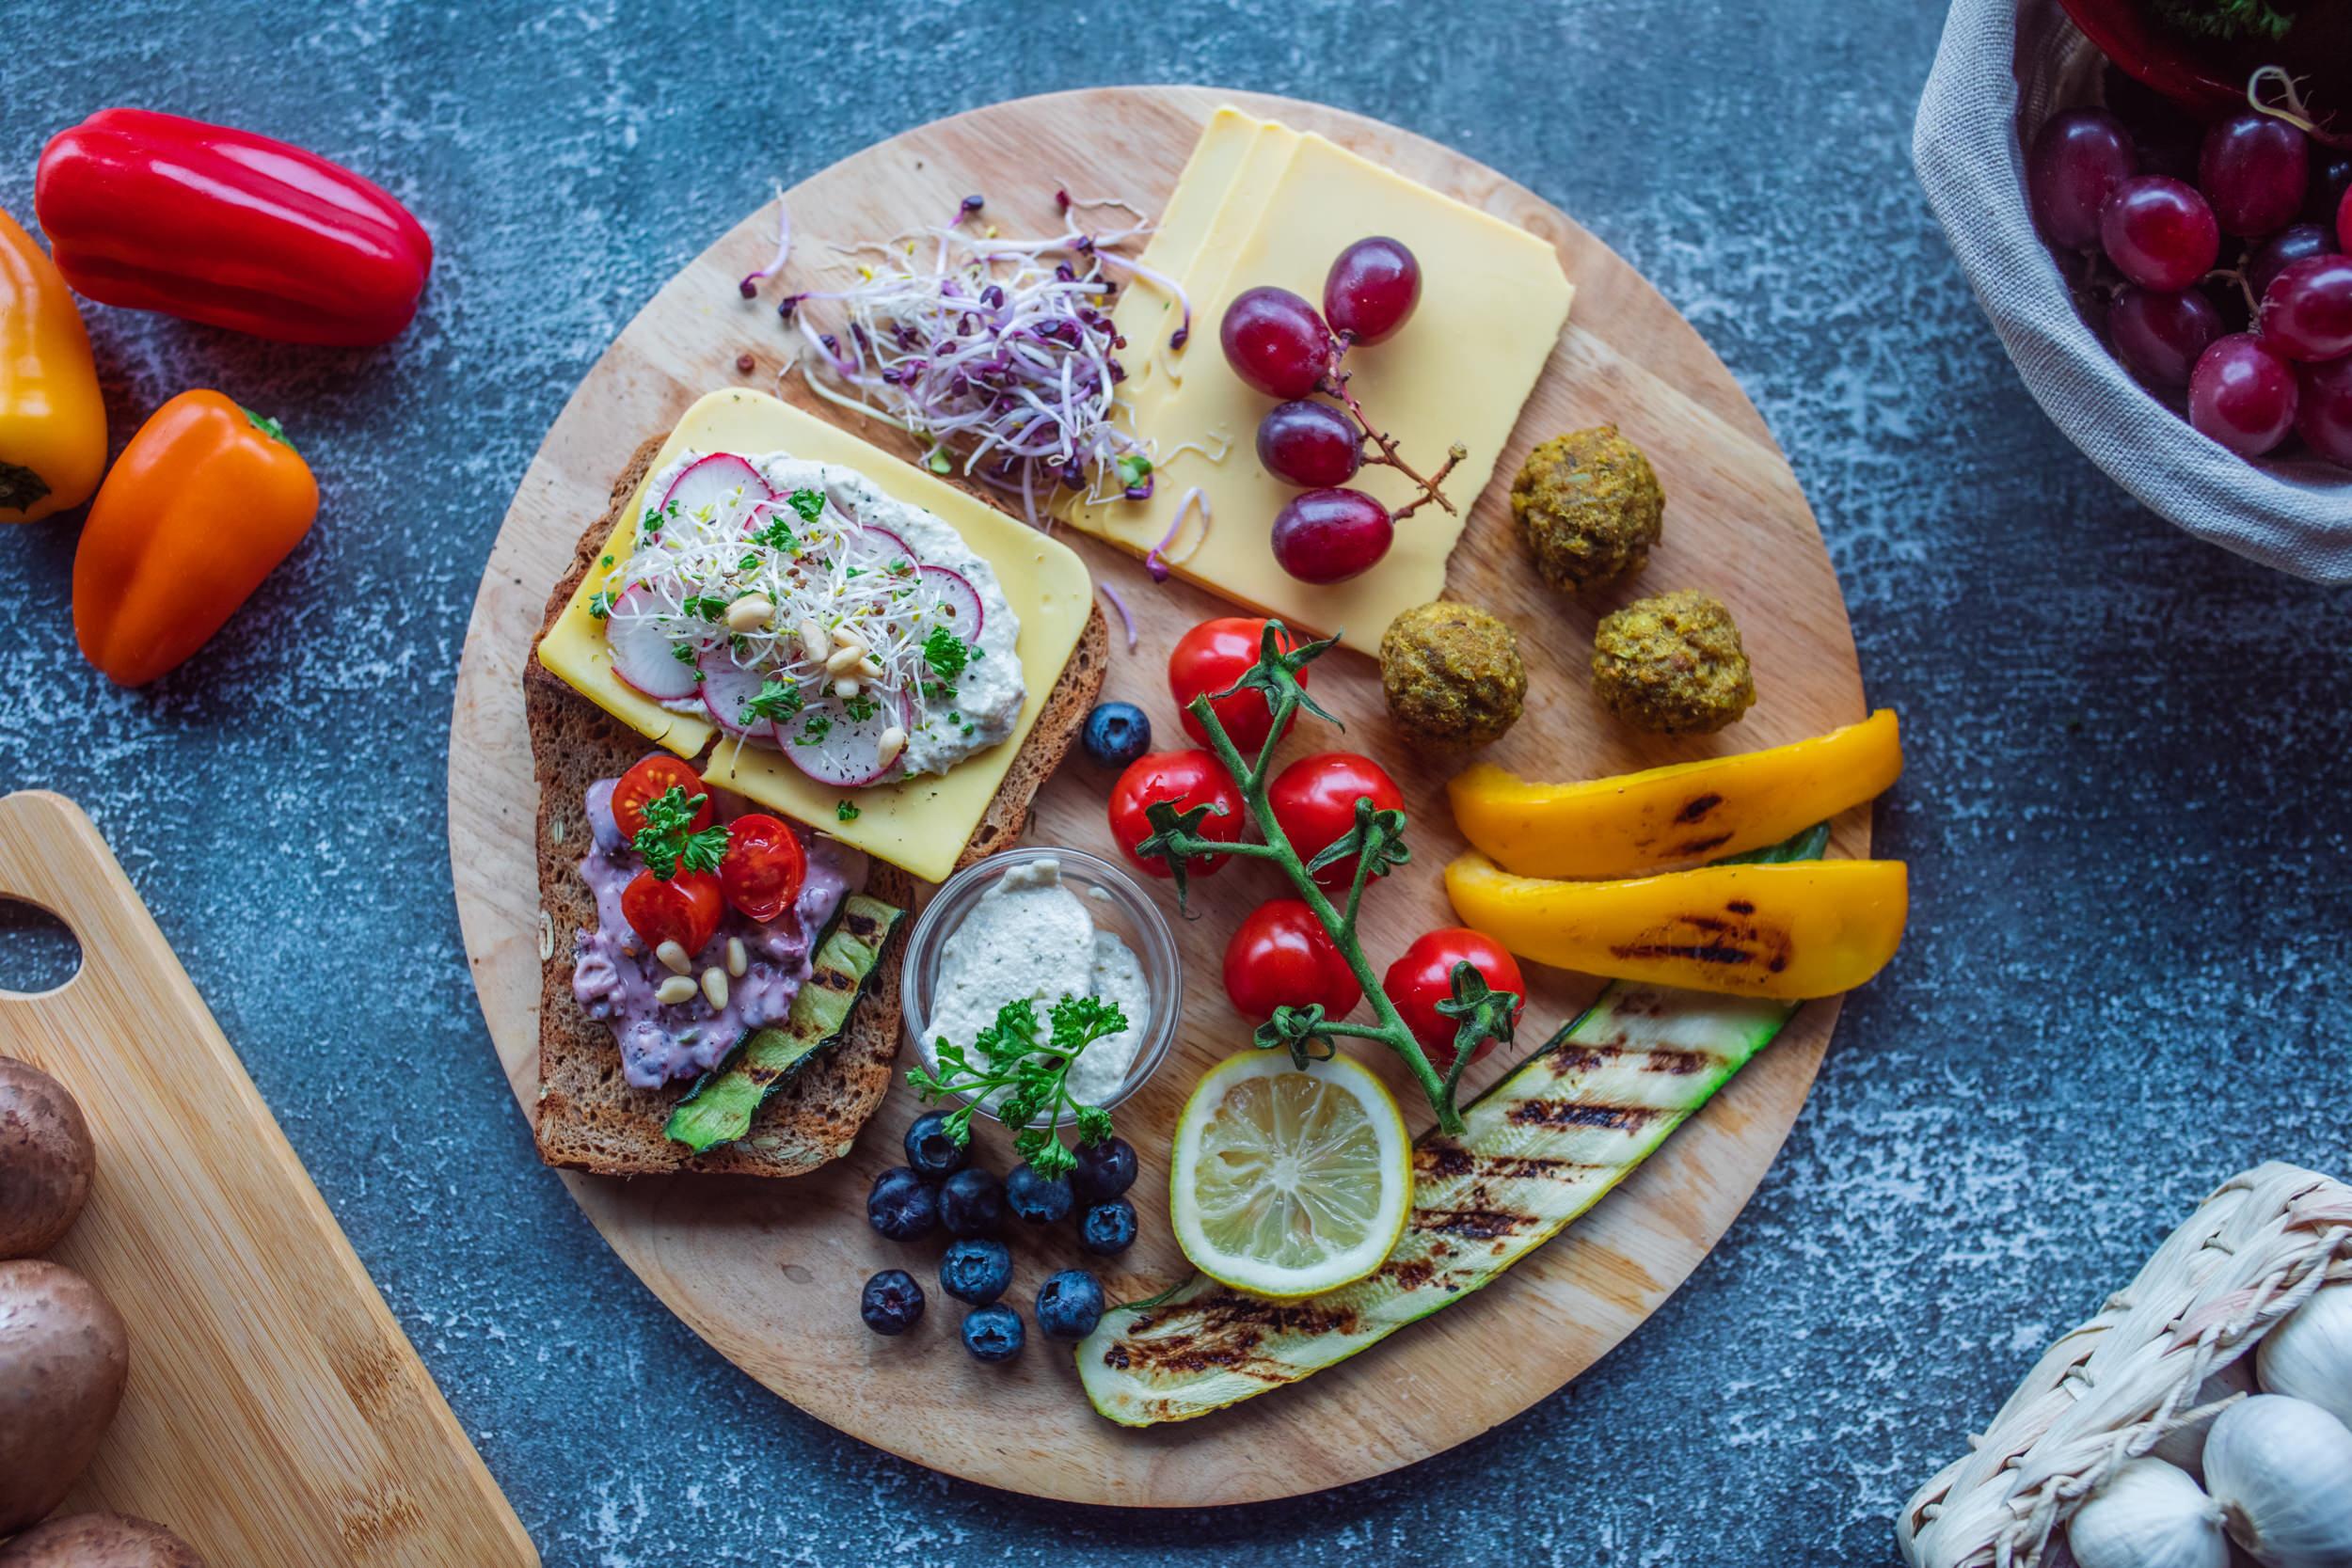 FOOD STUDIO PATRICKSCHMETZER ESSEN 14  Food